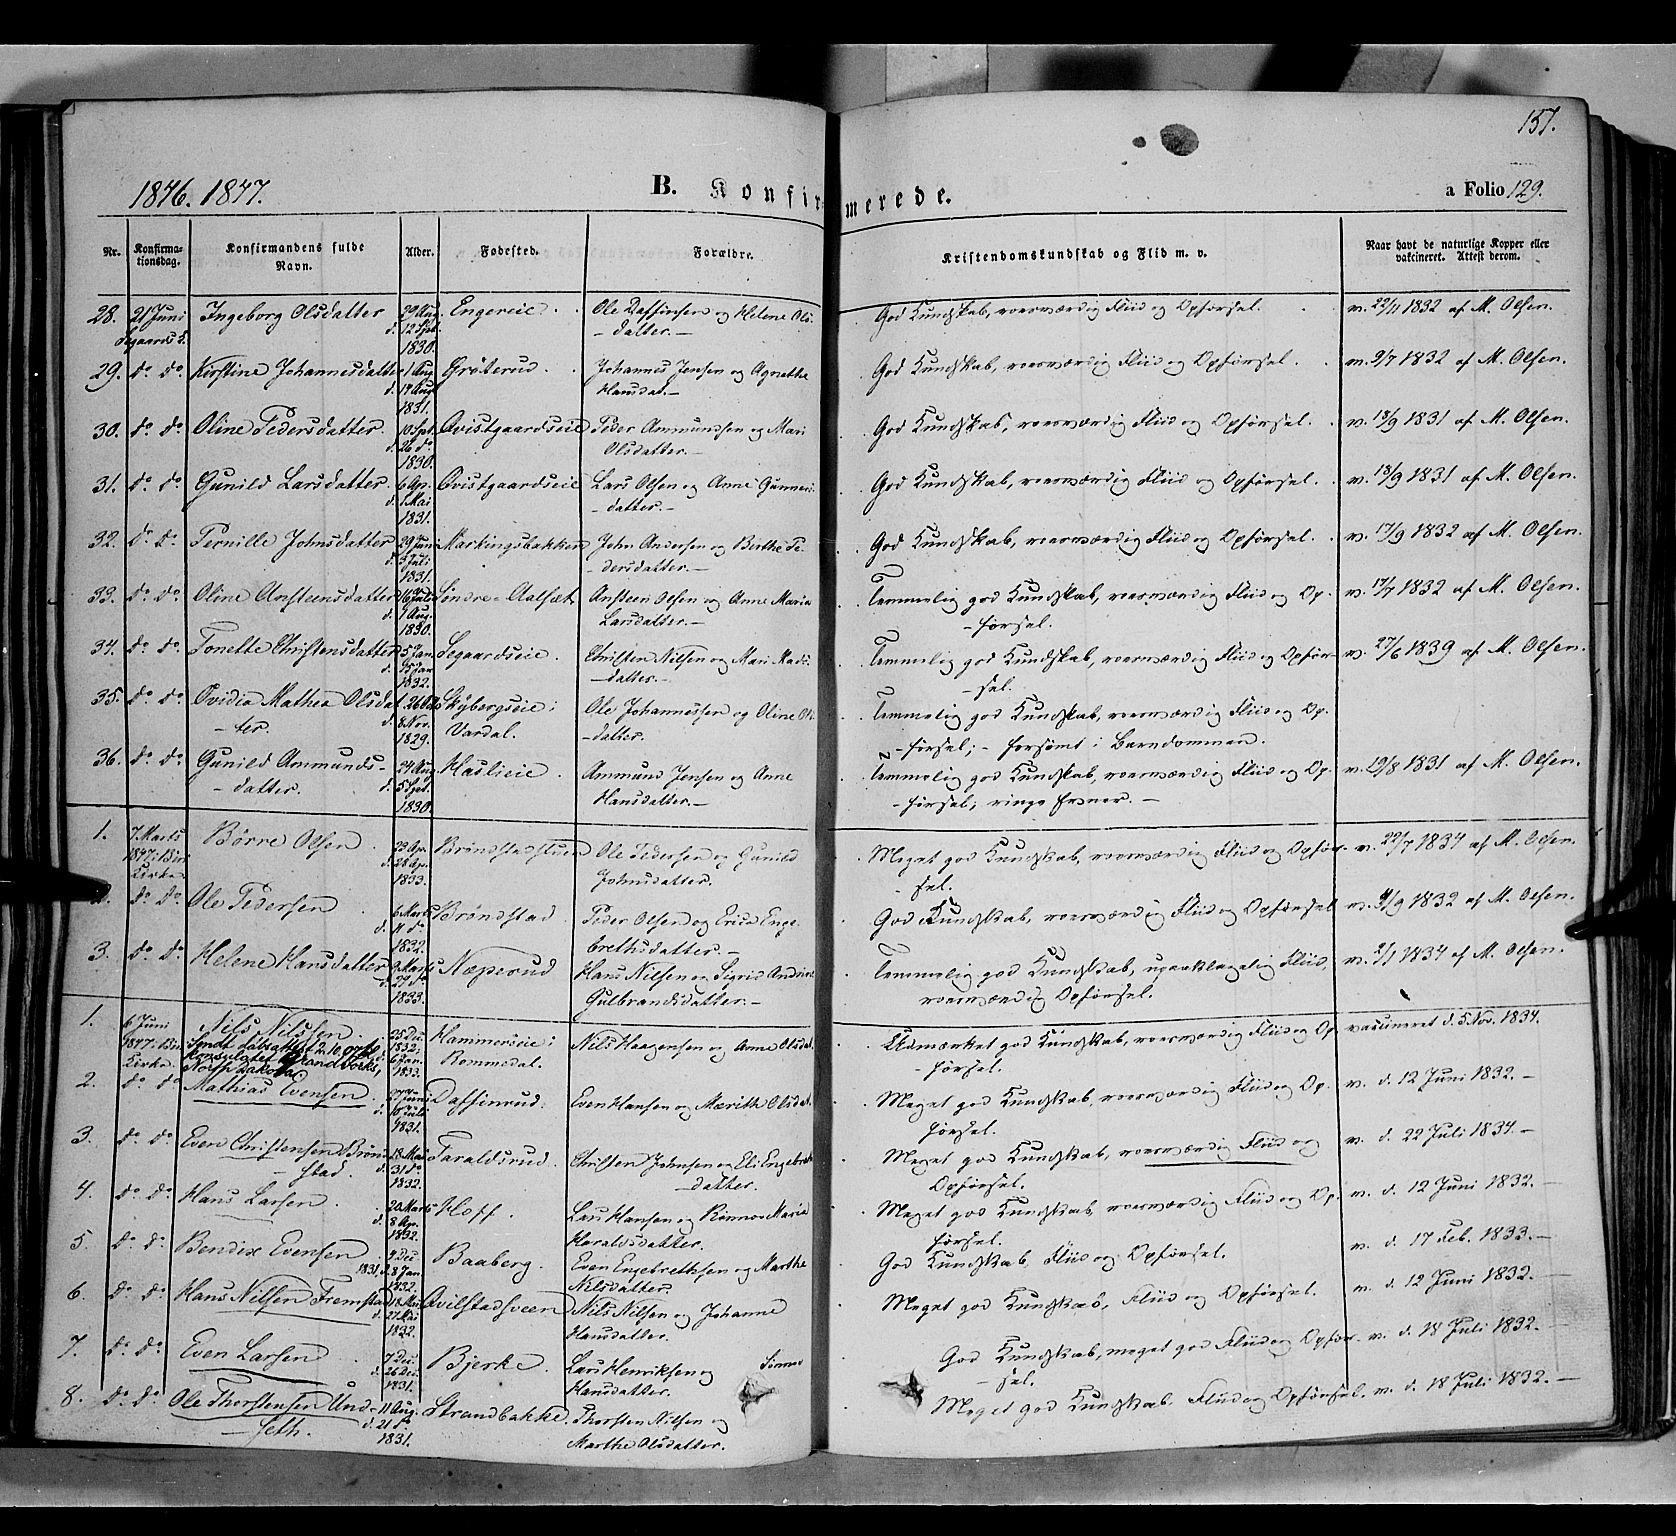 SAH, Biri prestekontor, Ministerialbok nr. 5, 1843-1854, s. 151